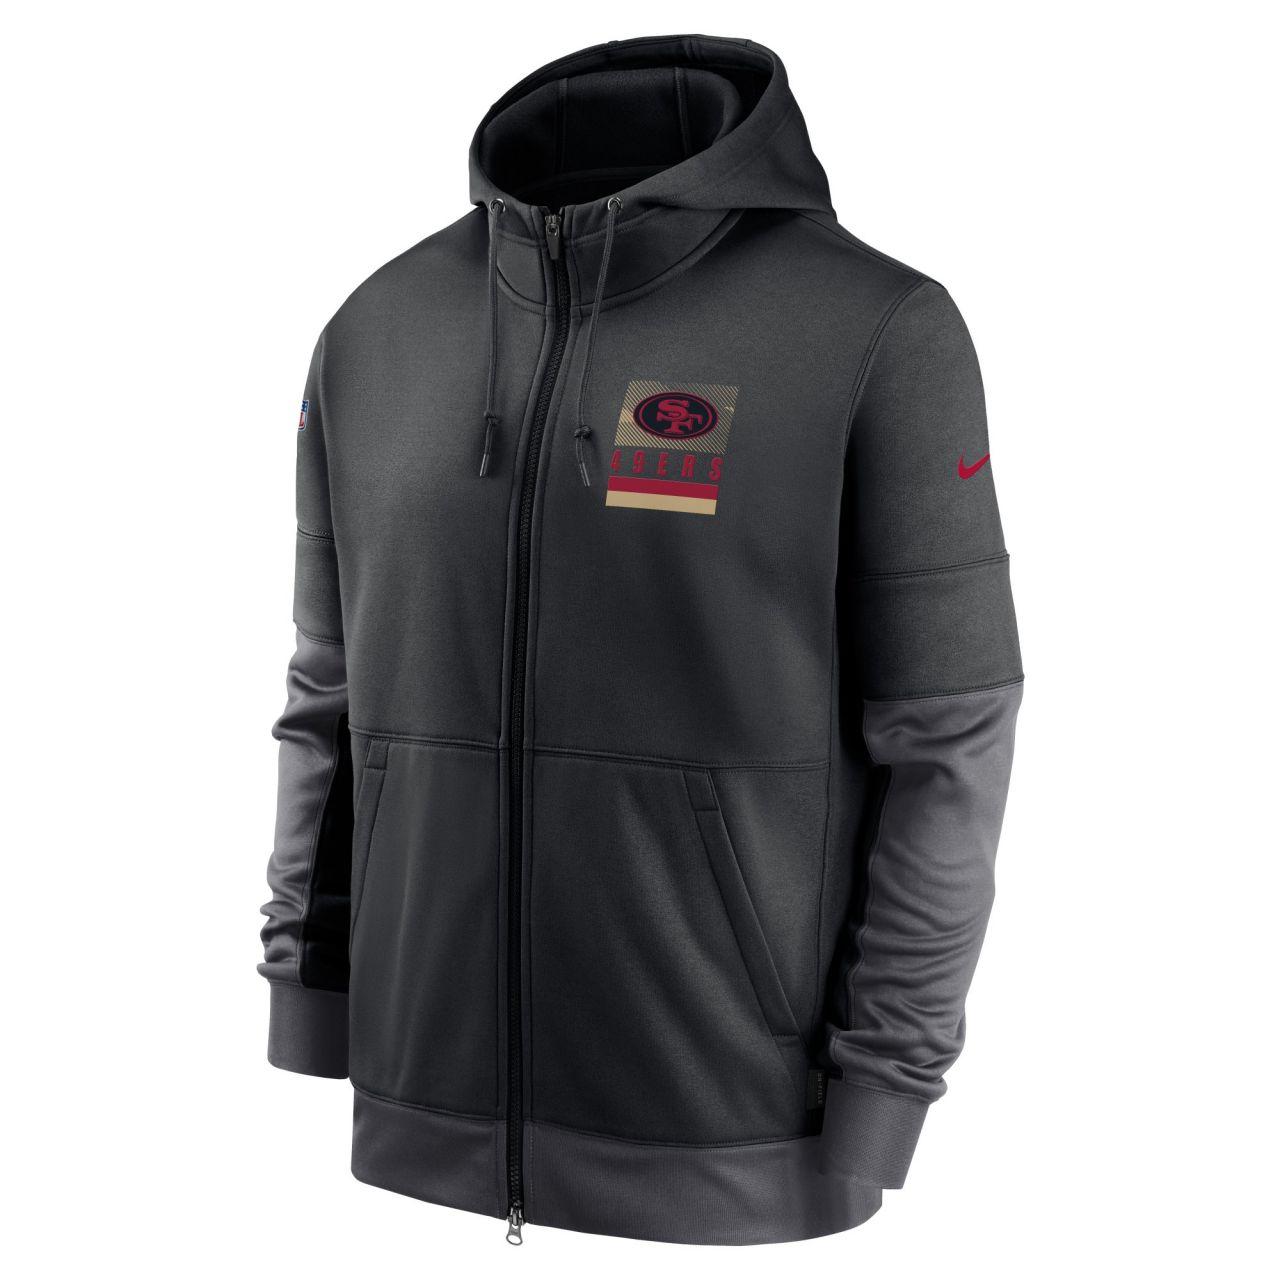 amfoo - Nike NFL Therma Zip Hoody - SIDELINE San Francisco 49ers